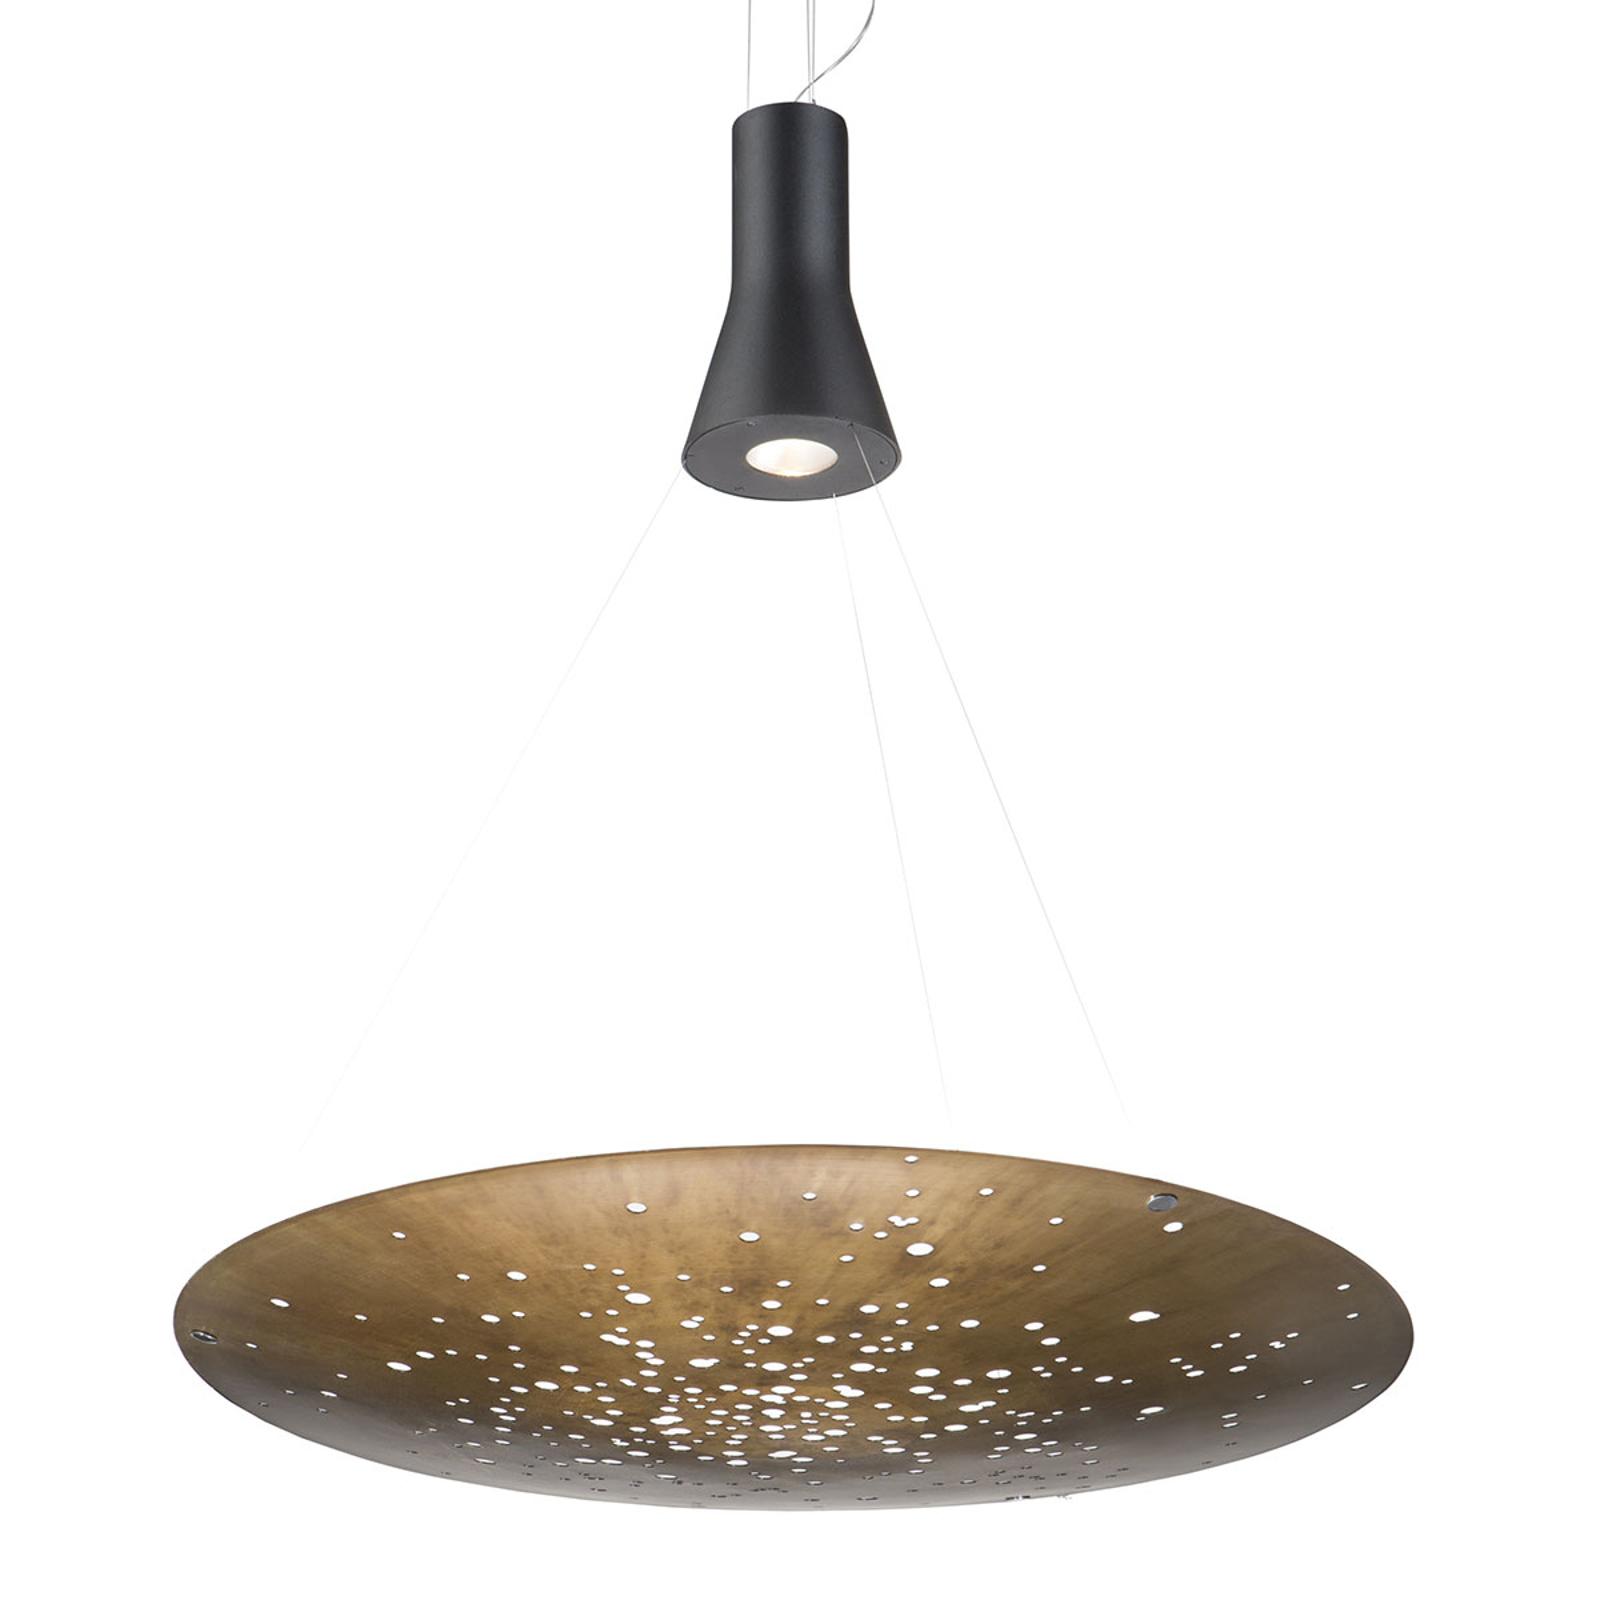 Fabbian Lens LED-Hängeleuchte Ø 90 cm bronze